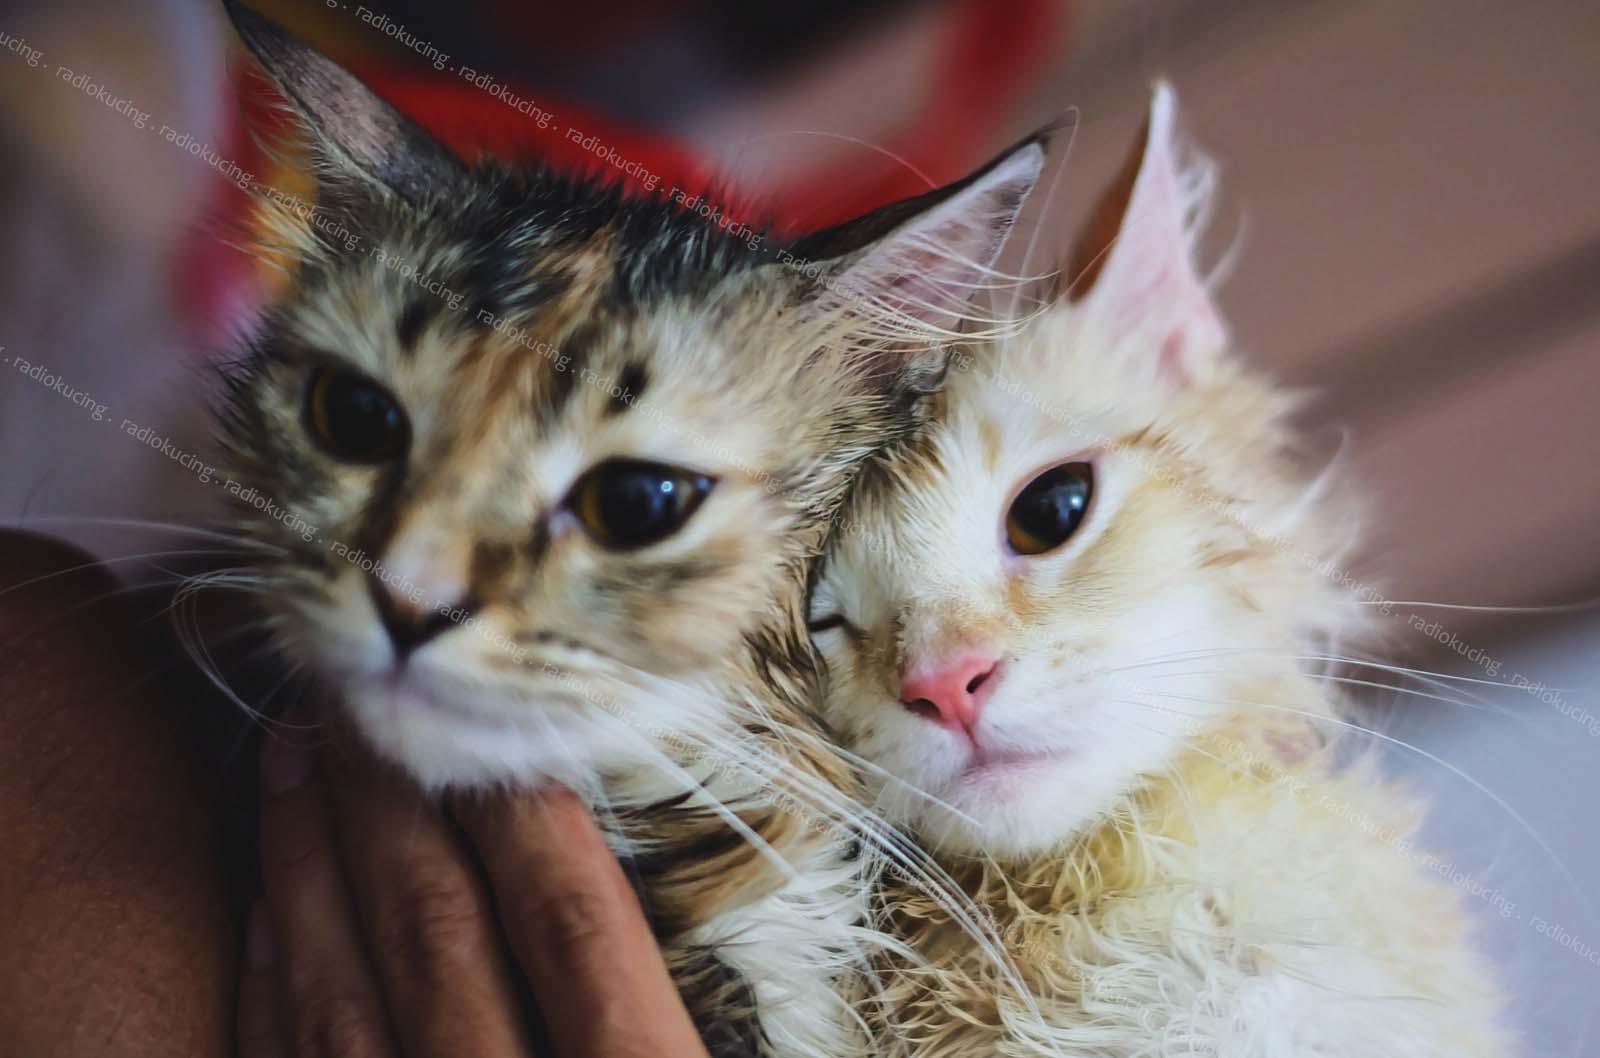 Review Minyak Tawon Penghilang Kutu Jamur Pada Kucing Anjing Dan Hewan Peliharaan Pet Radiokucing Com